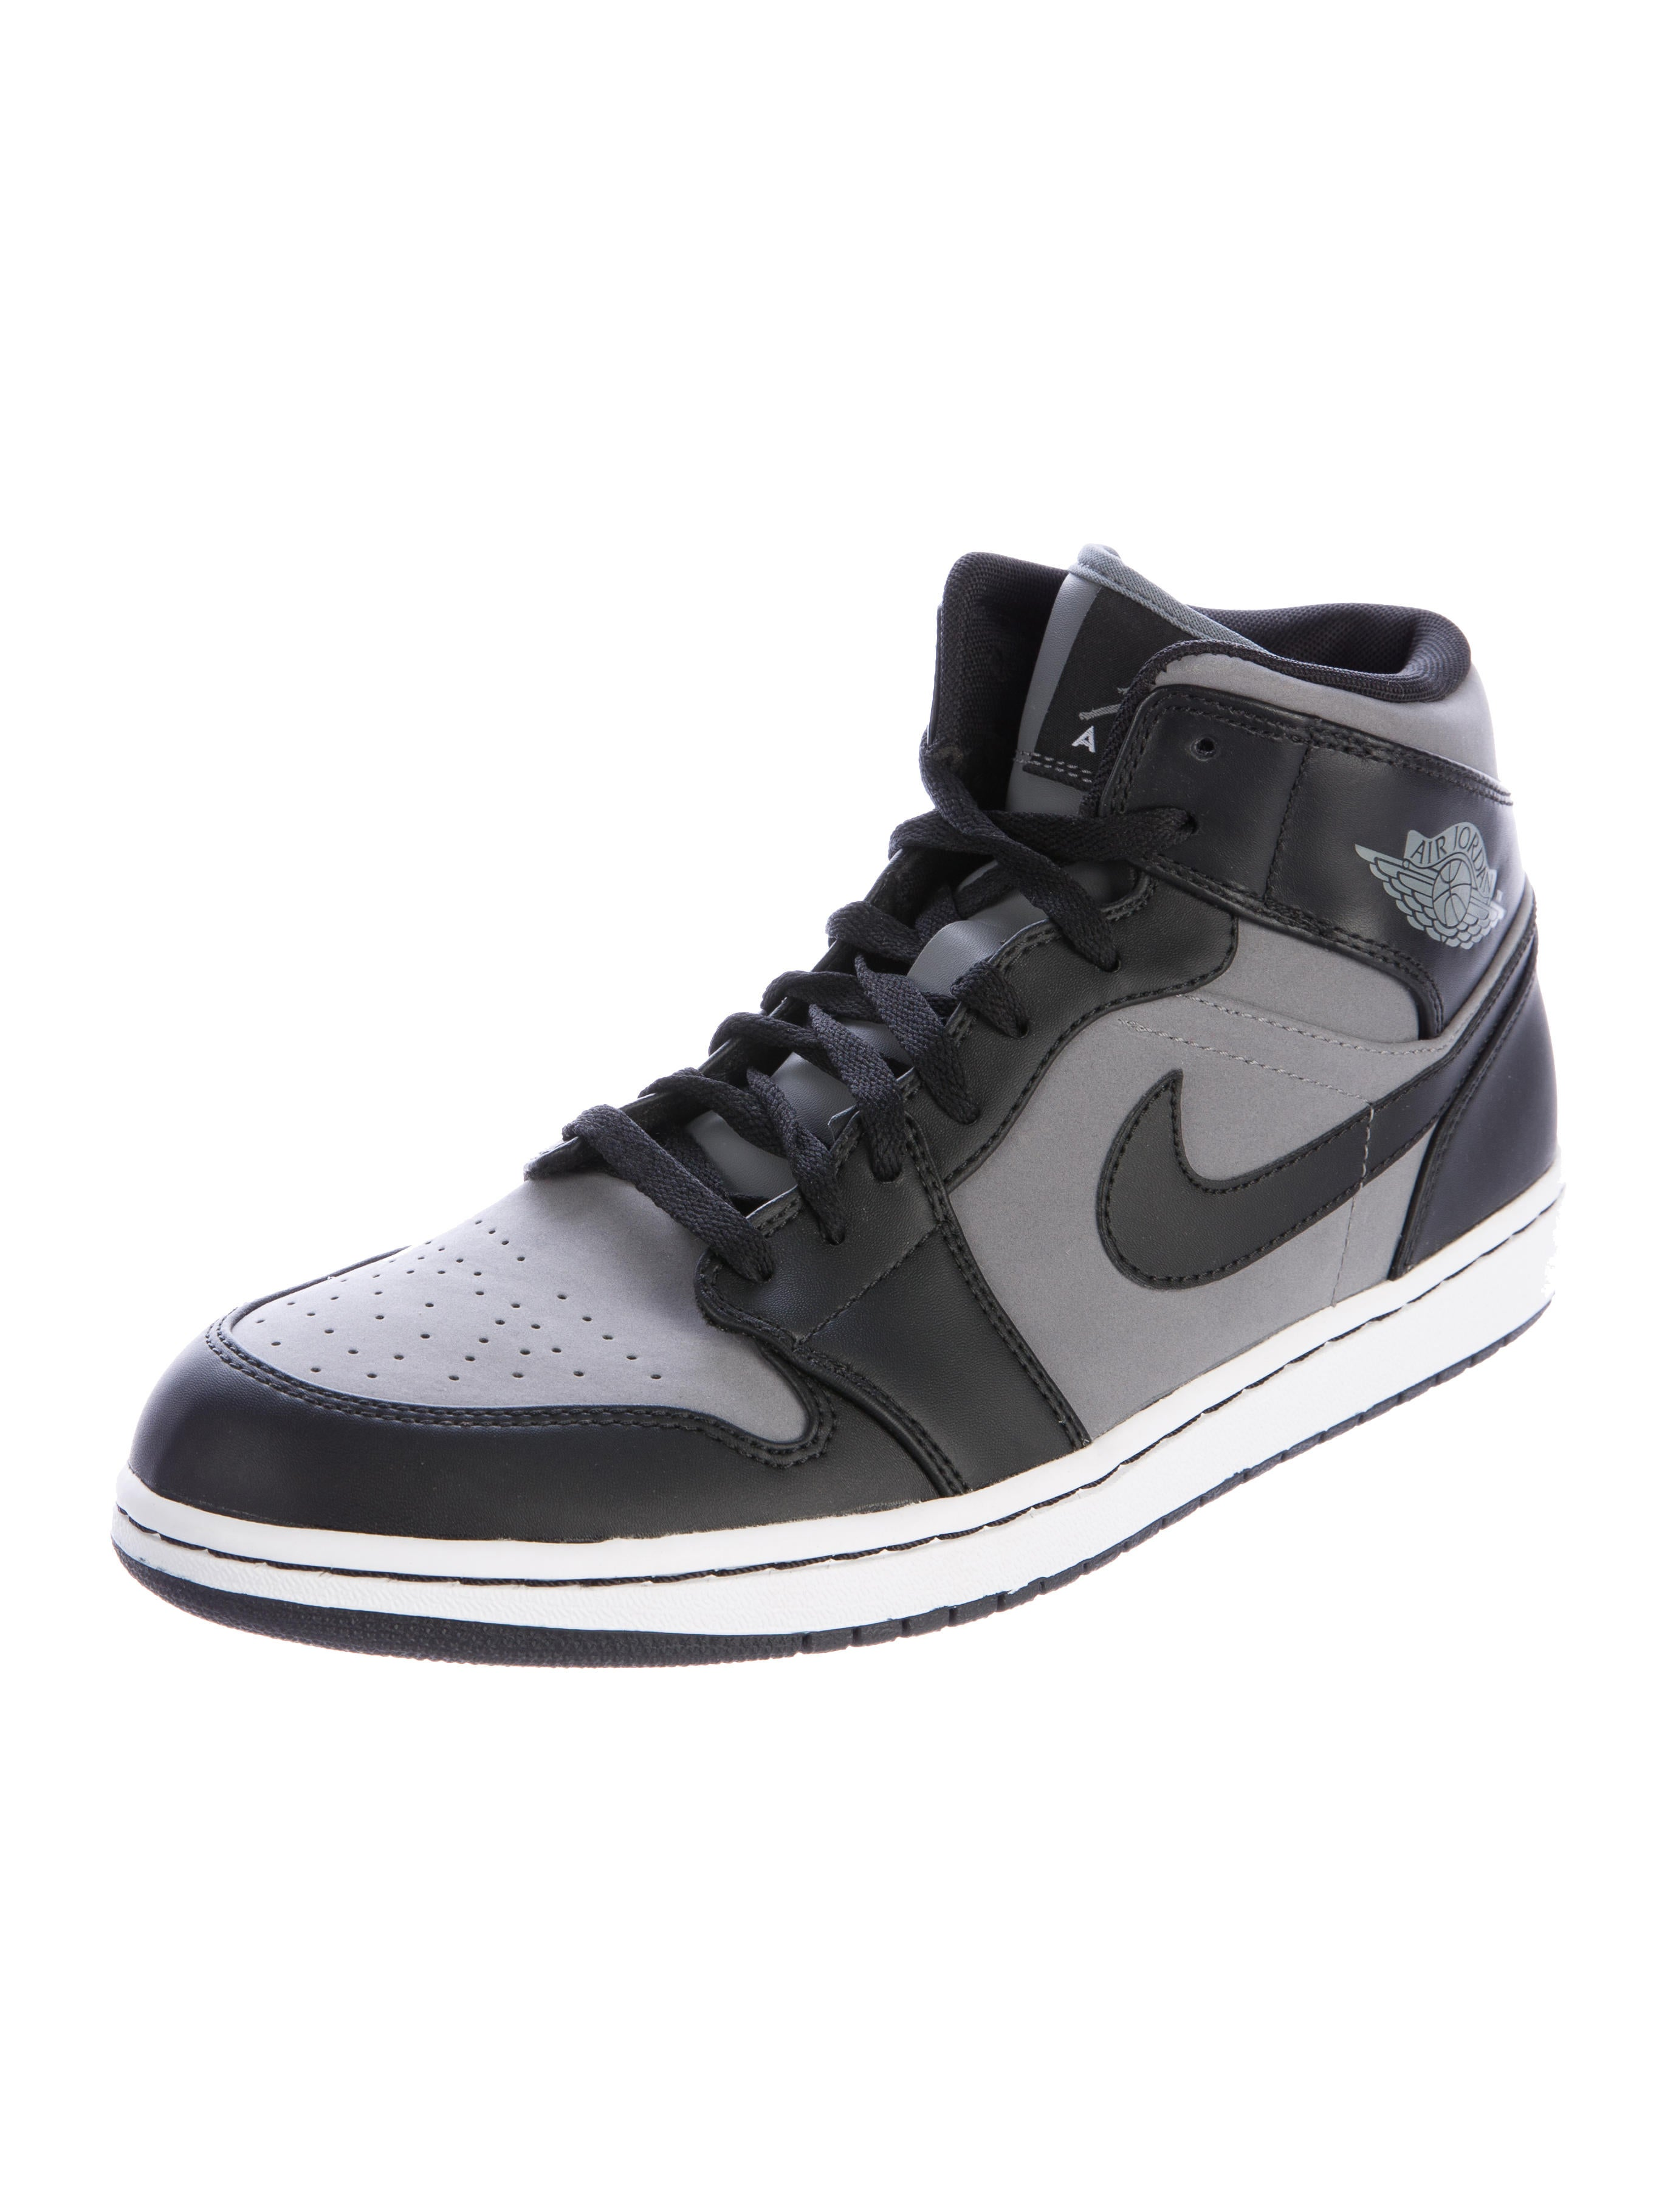 nike air jordan 1 mid sneakers w tags shoes. Black Bedroom Furniture Sets. Home Design Ideas